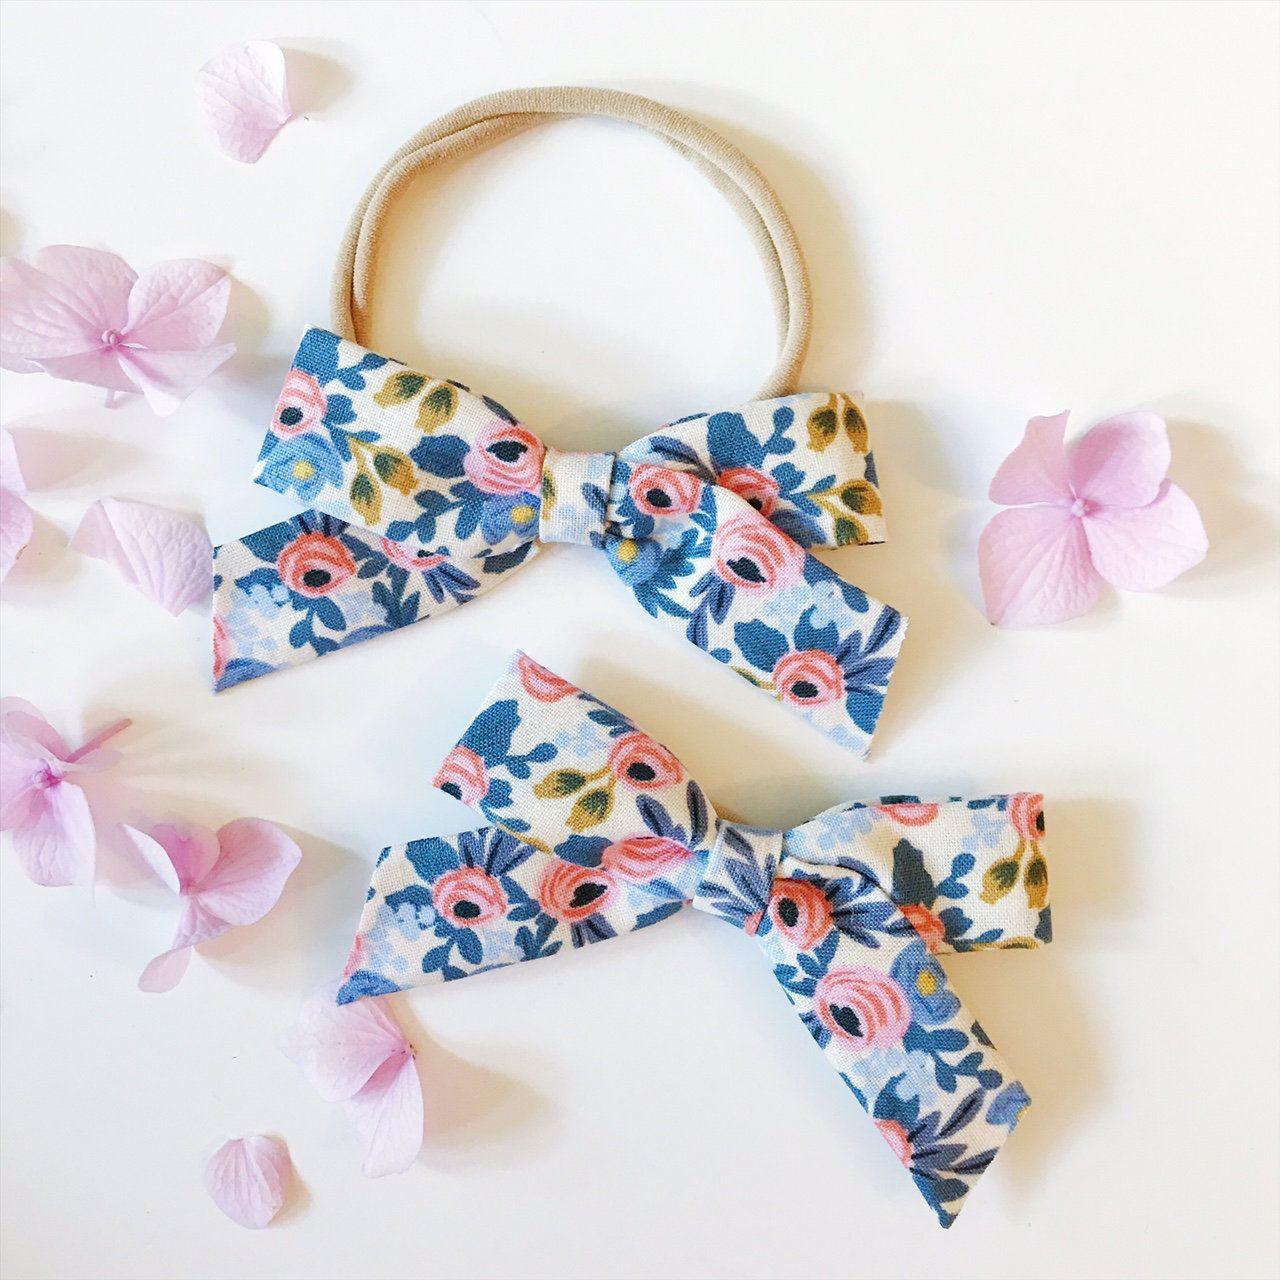 bows baby bows Spring bows Rifle paper hair clip floral baby headband Rifle Paper Bow Floral baby bow Newborn headband newborn bow